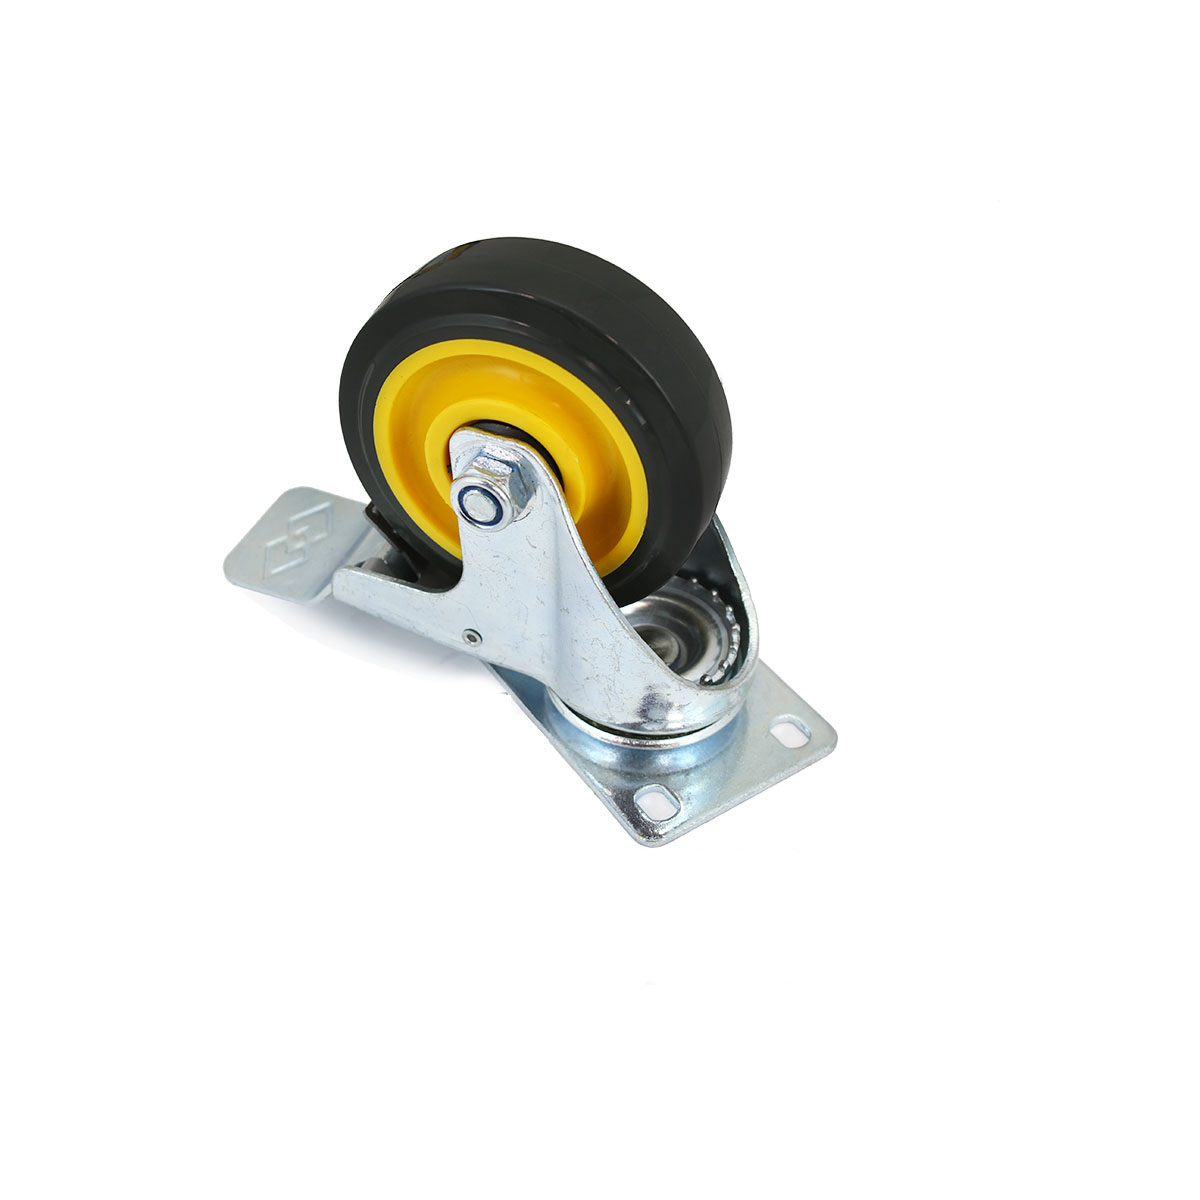 4 Pack Beach Chair Swivel Caster Rubber Wheel Steel Top Plate Ball Bearings US